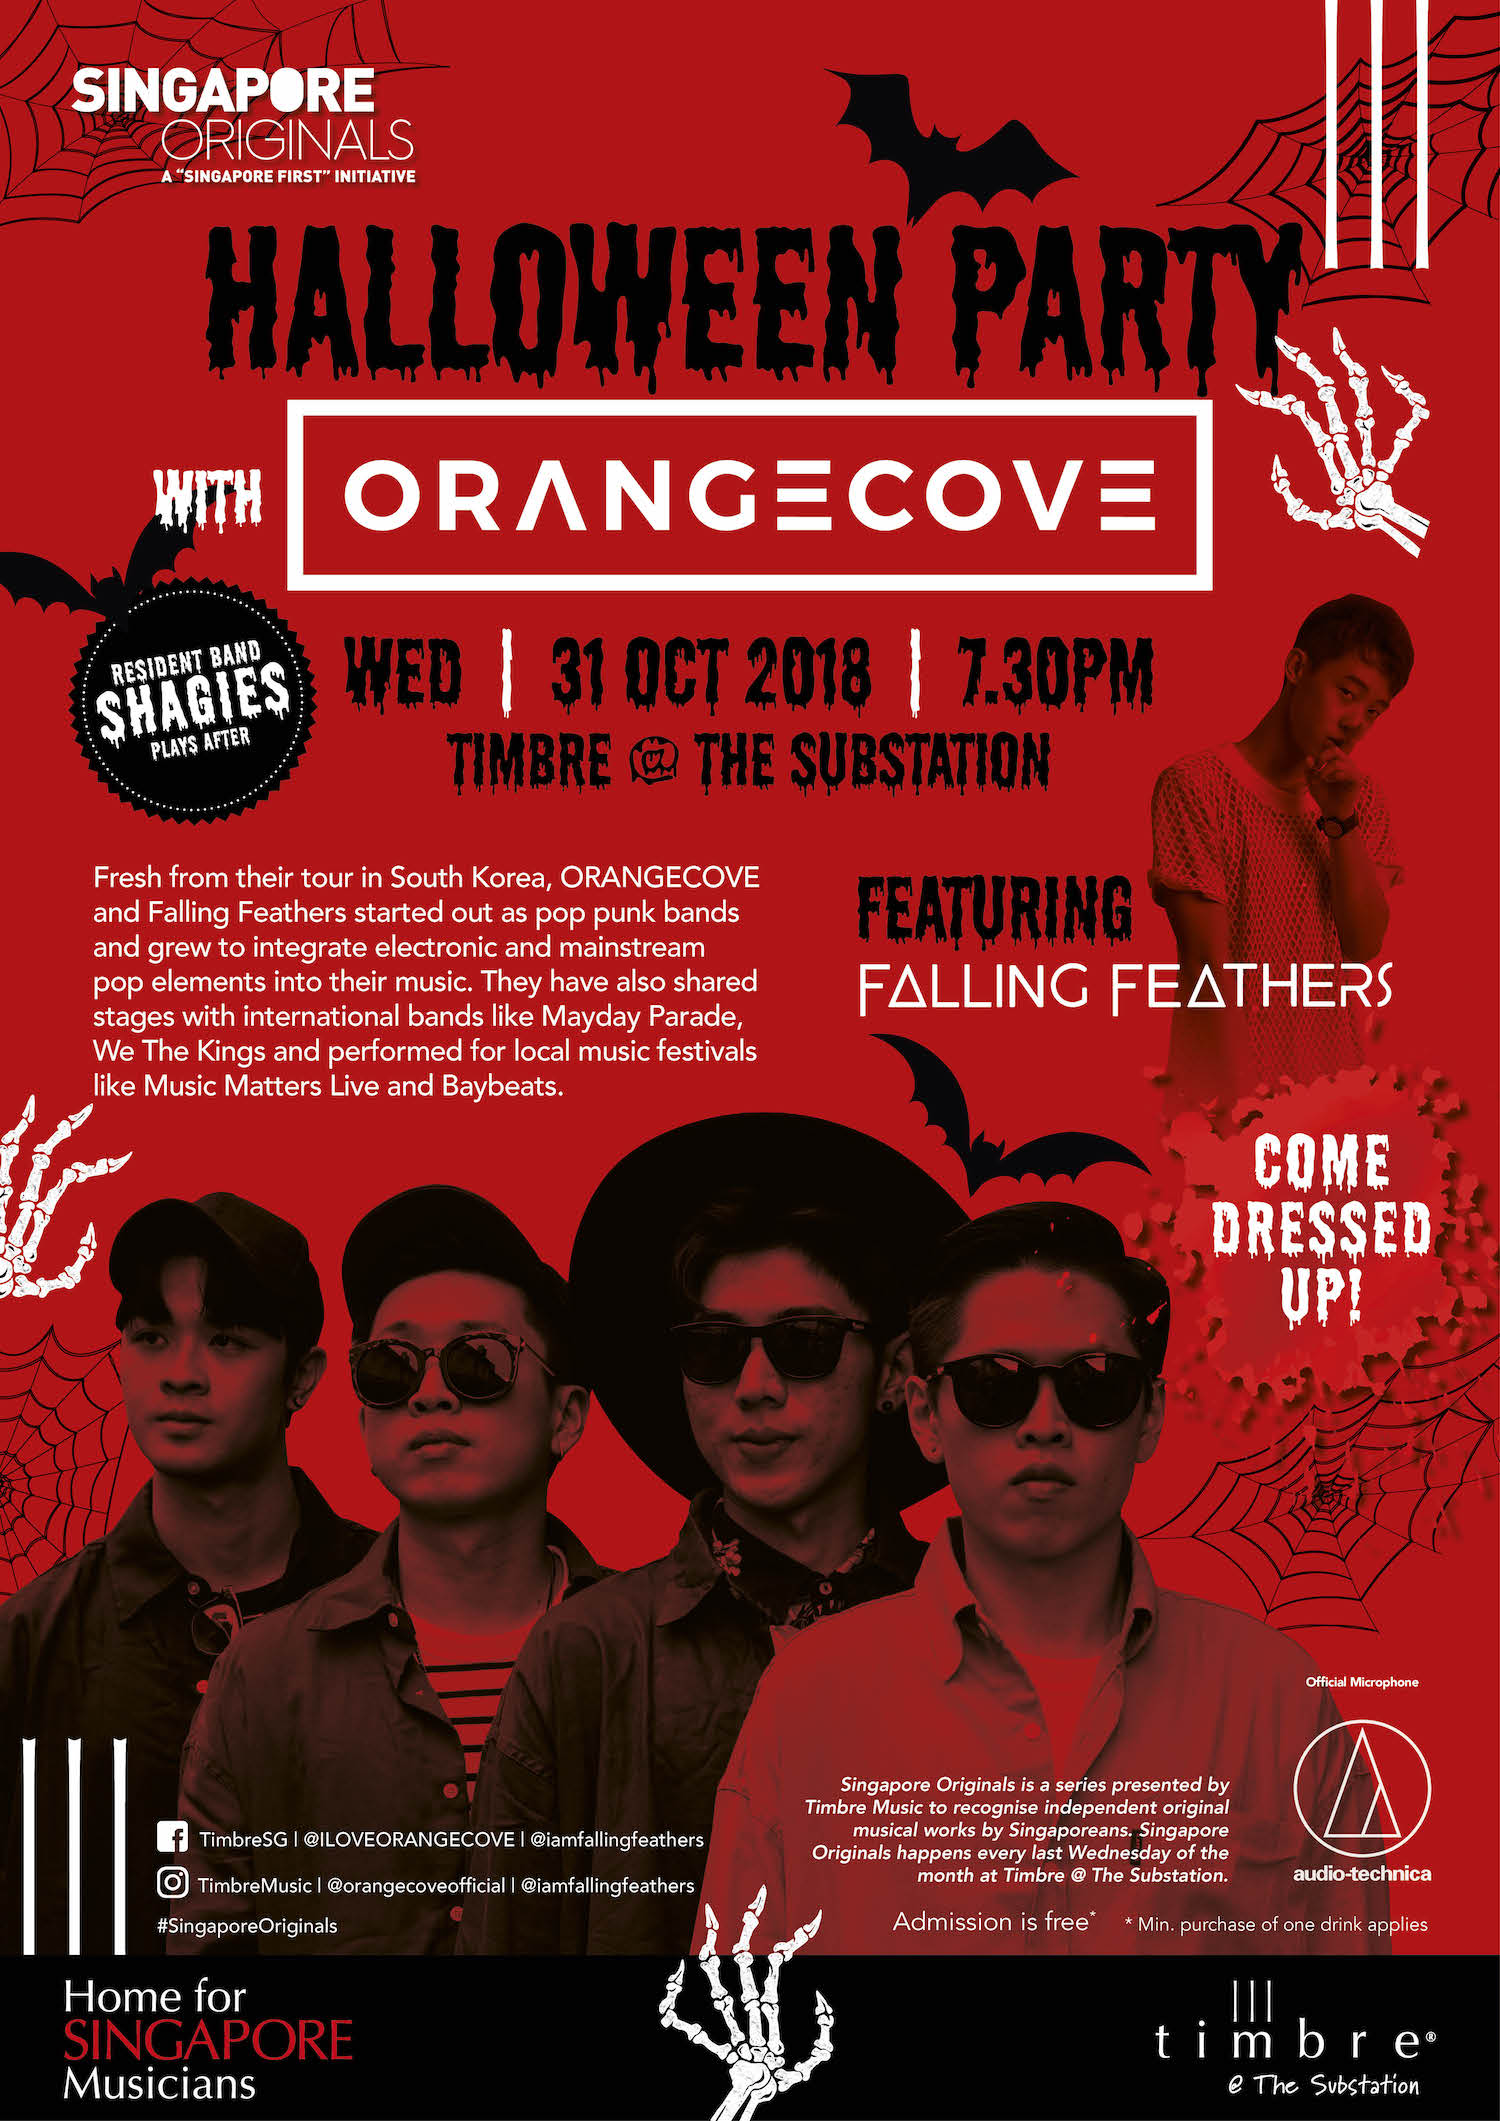 Singapore Originals Halloween Party With Orangecove Ft Falling